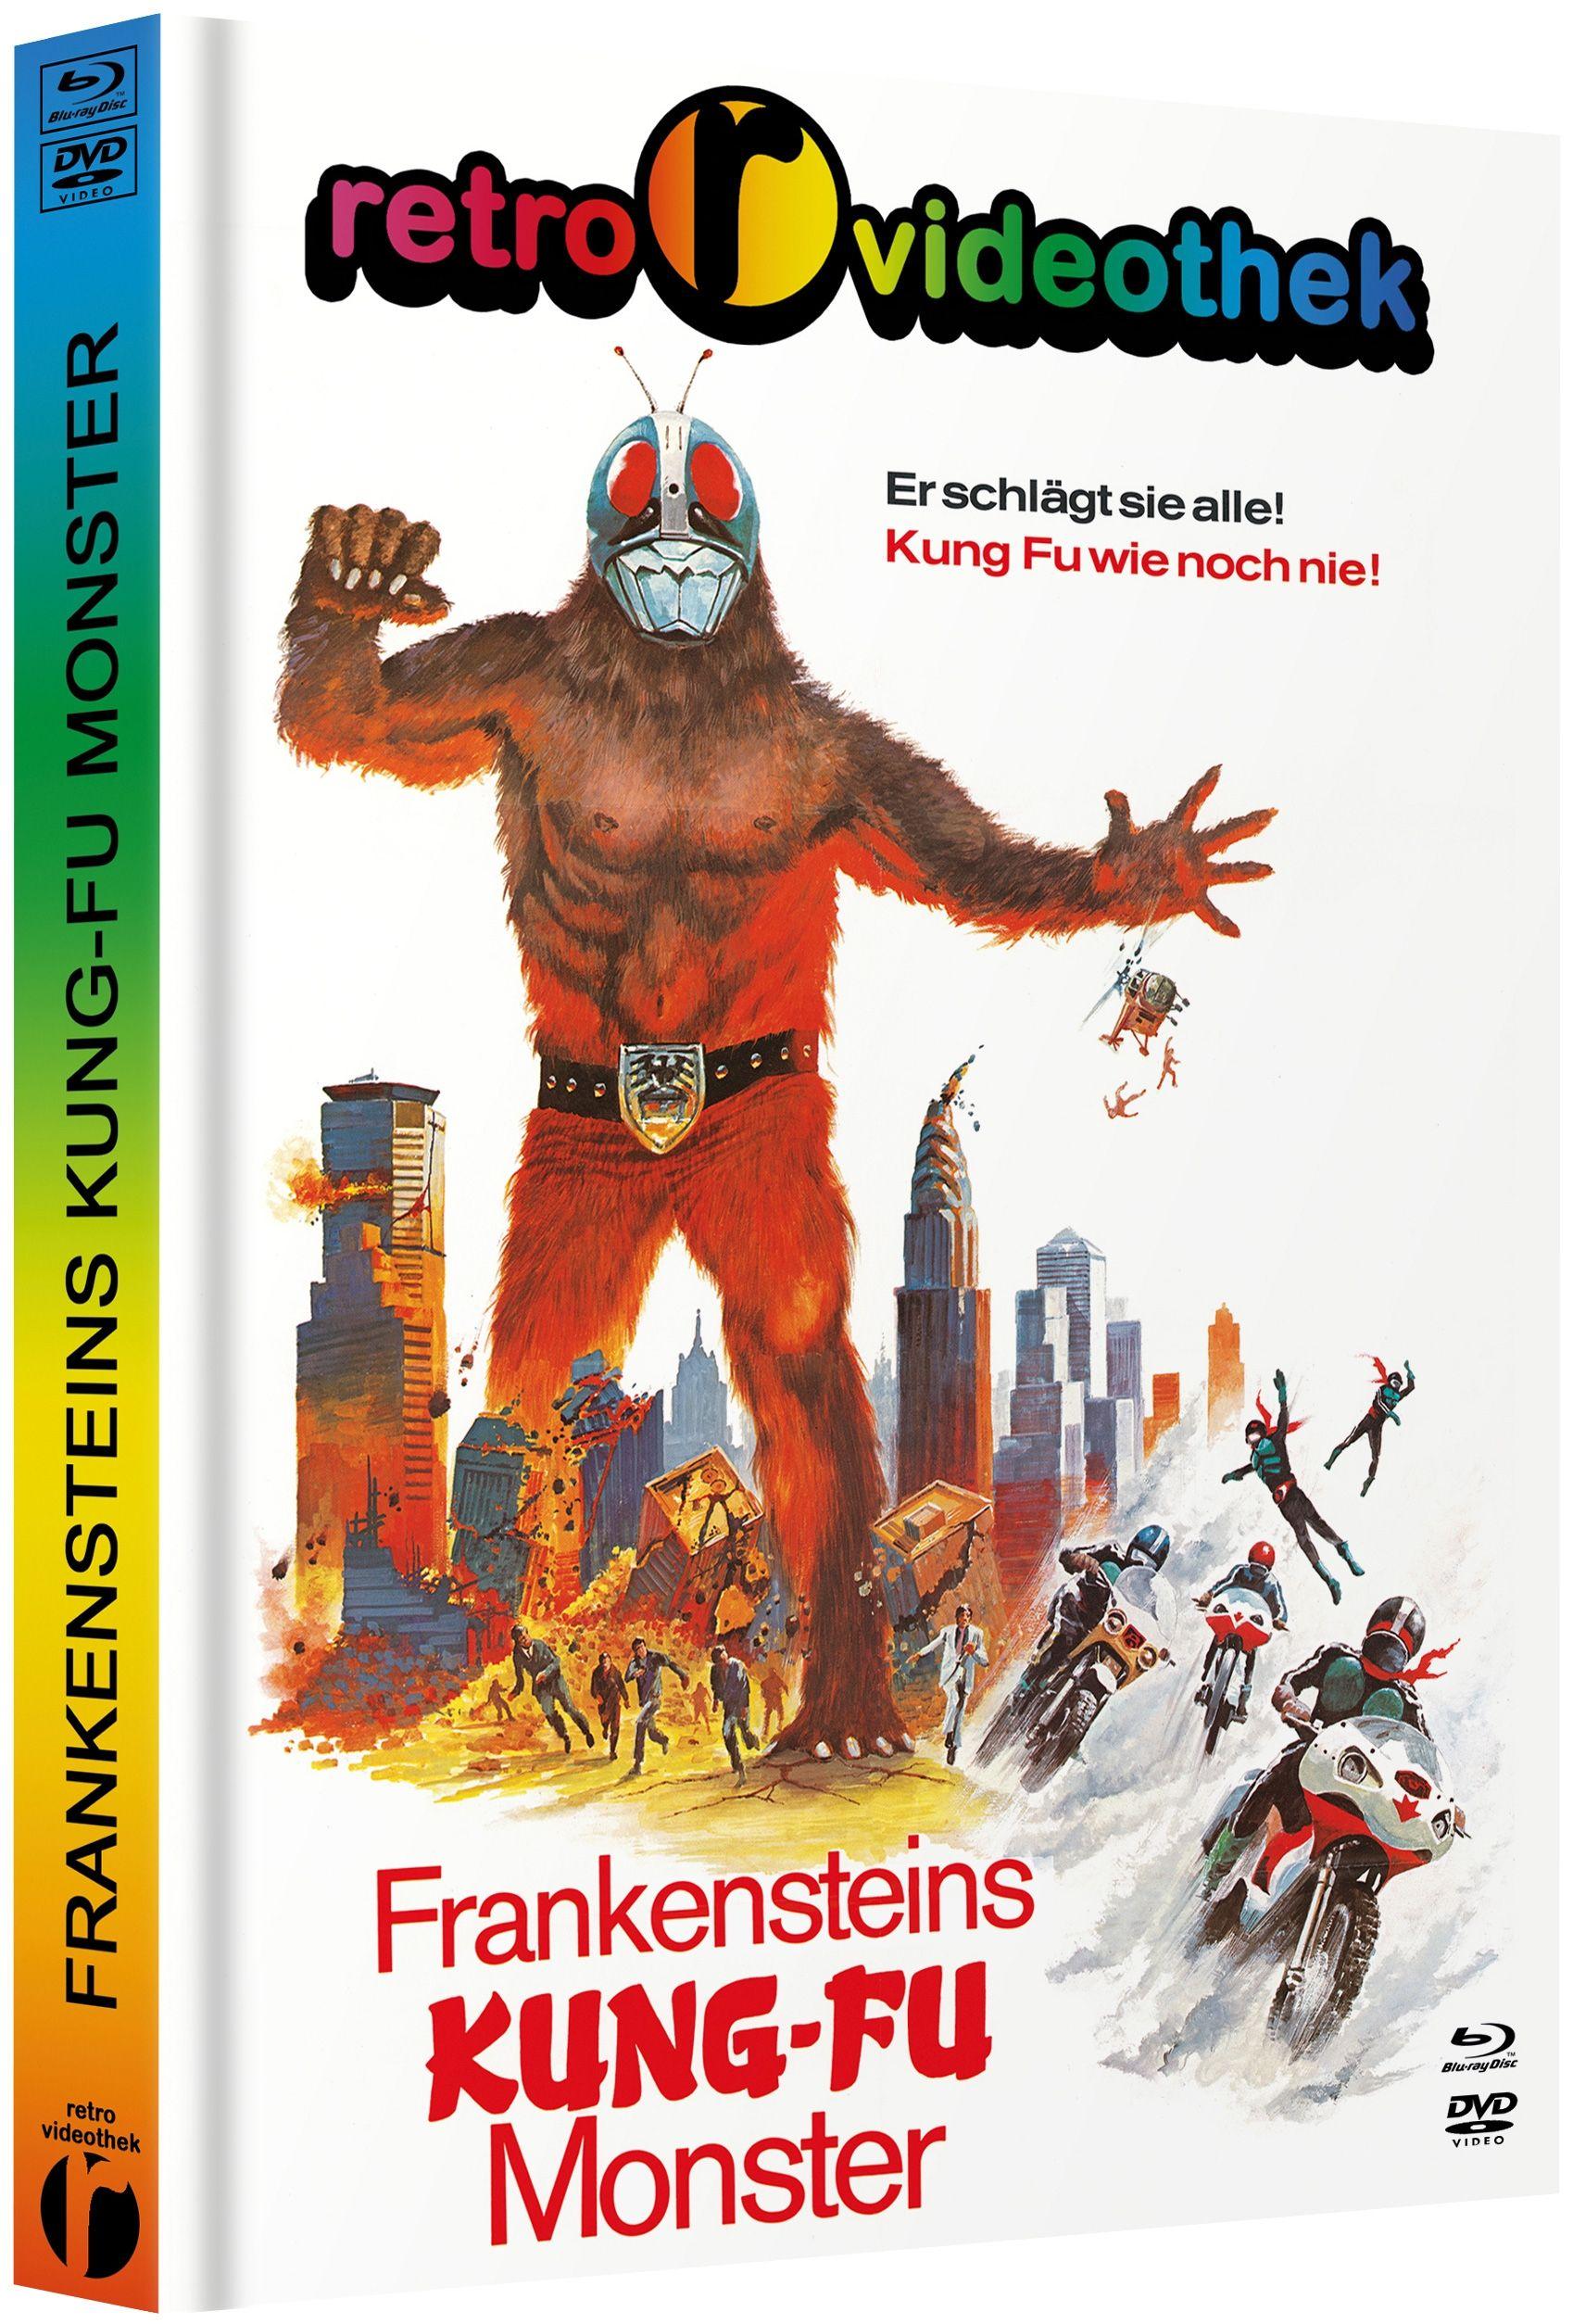 Frankensteins Kung-Fu Monster (Lim. Uncut Mediabook - Cover D) (DVD + BLURAY)